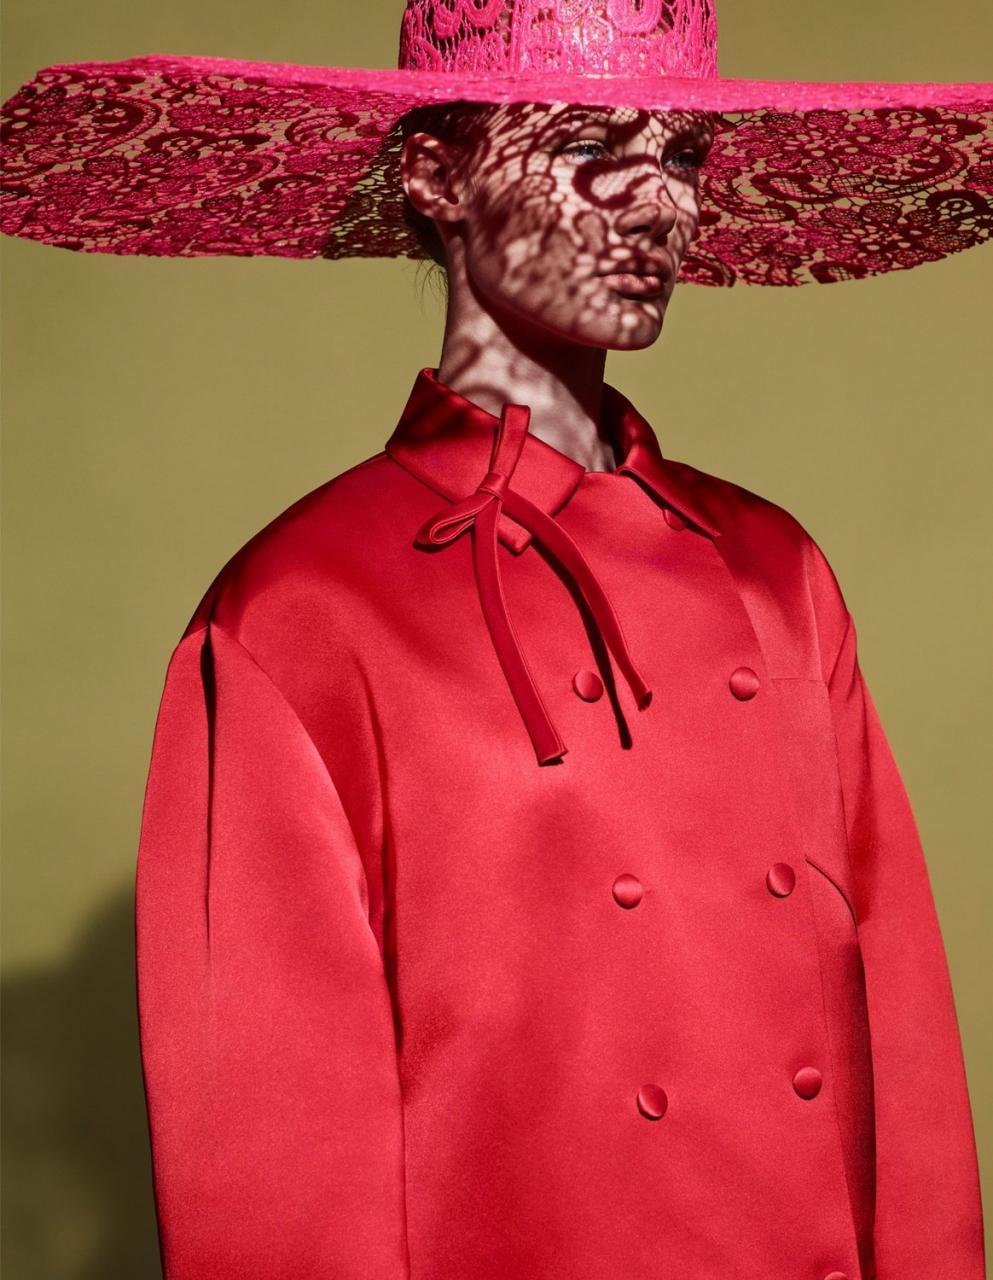 《VOGUE》中国版2019年1月刊 超模Kris Grikaite出镜 时尚图库 第10张